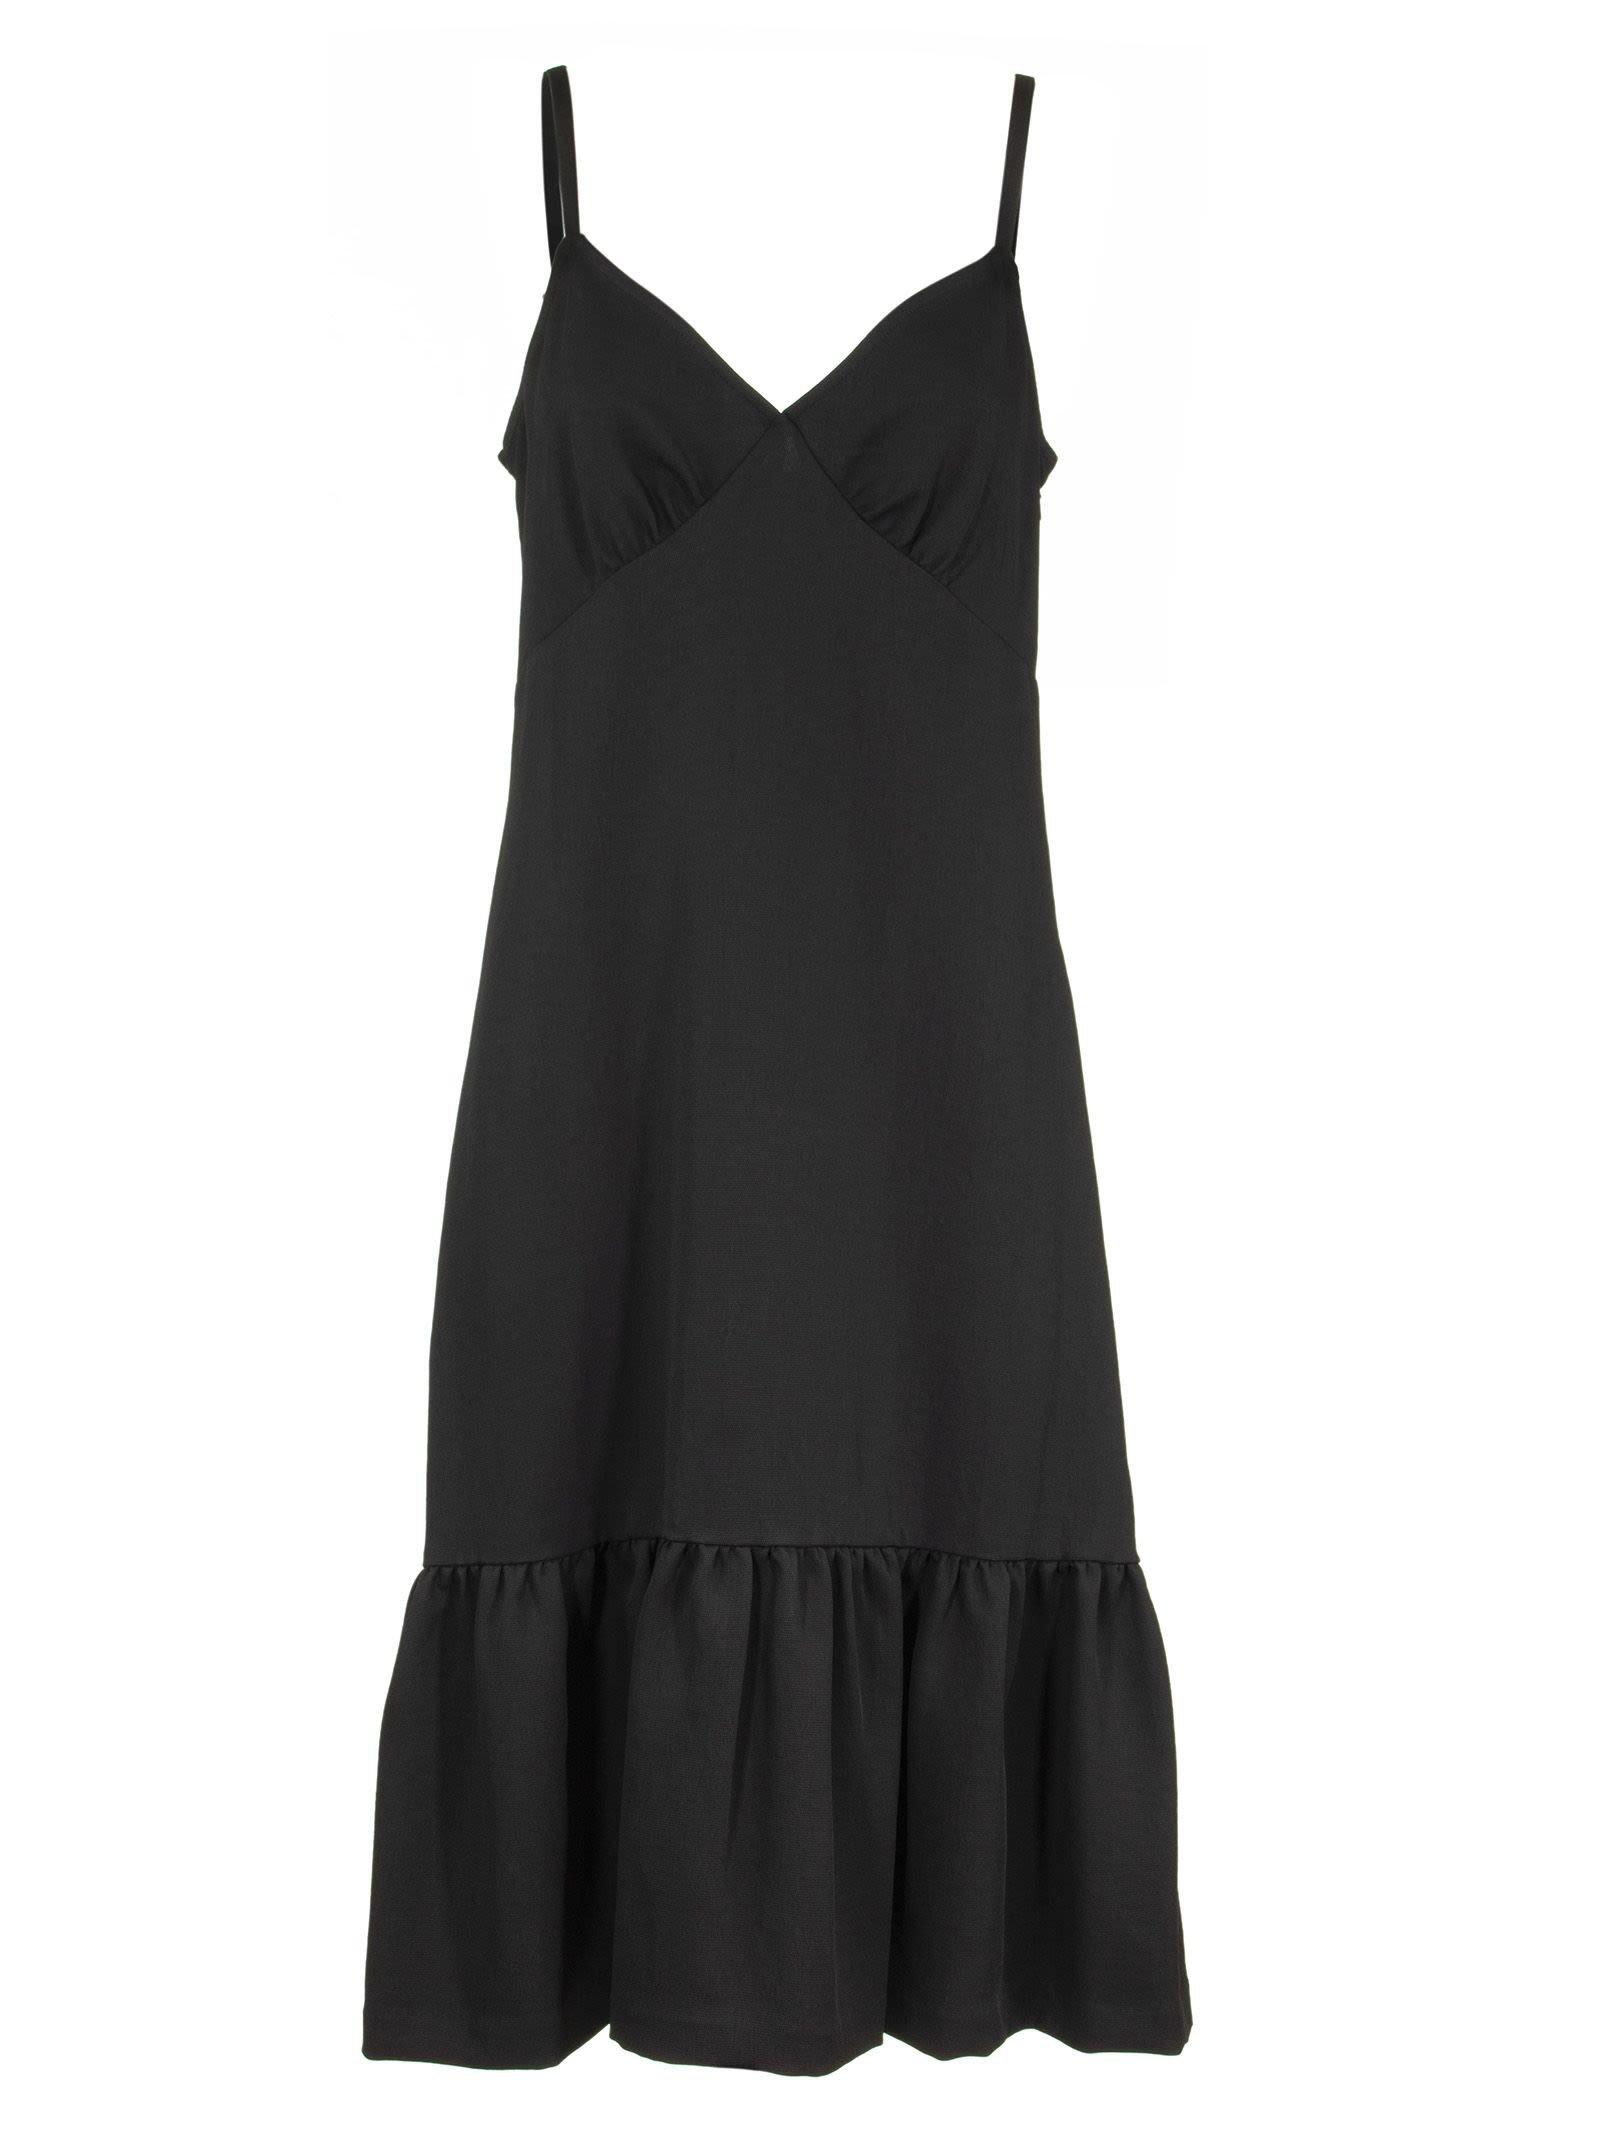 Michael Kors Ruffled Slip Dress